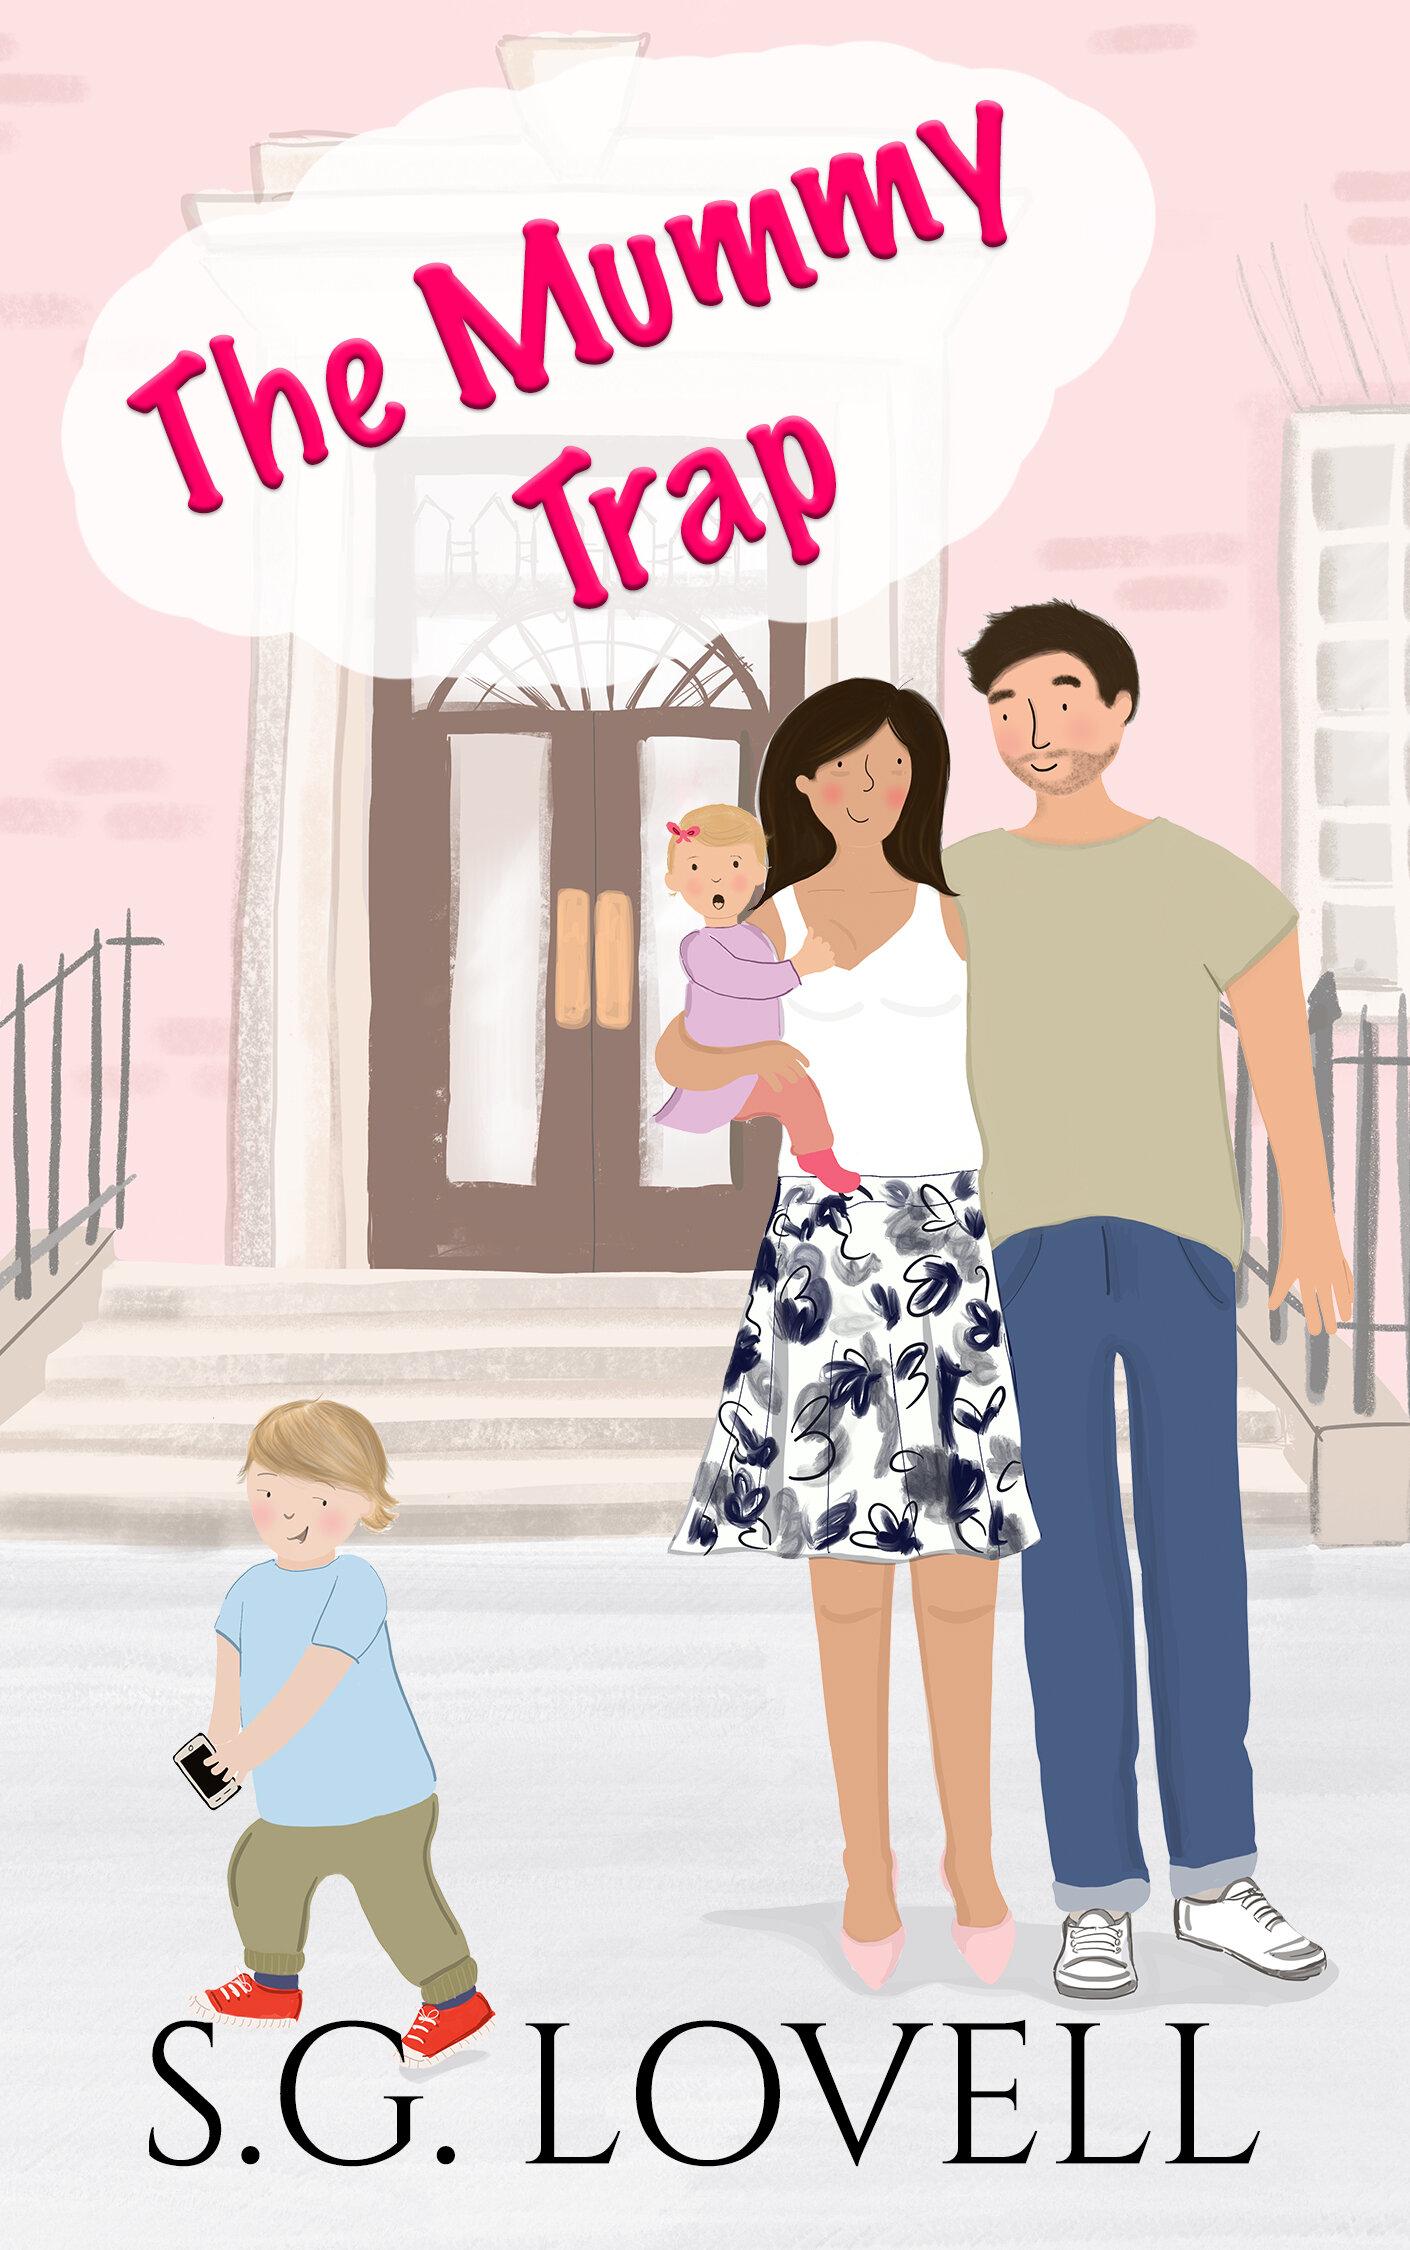 """Hilarious, addictive and a highly relatable read"" - - Mummyblogger Farron Owen"